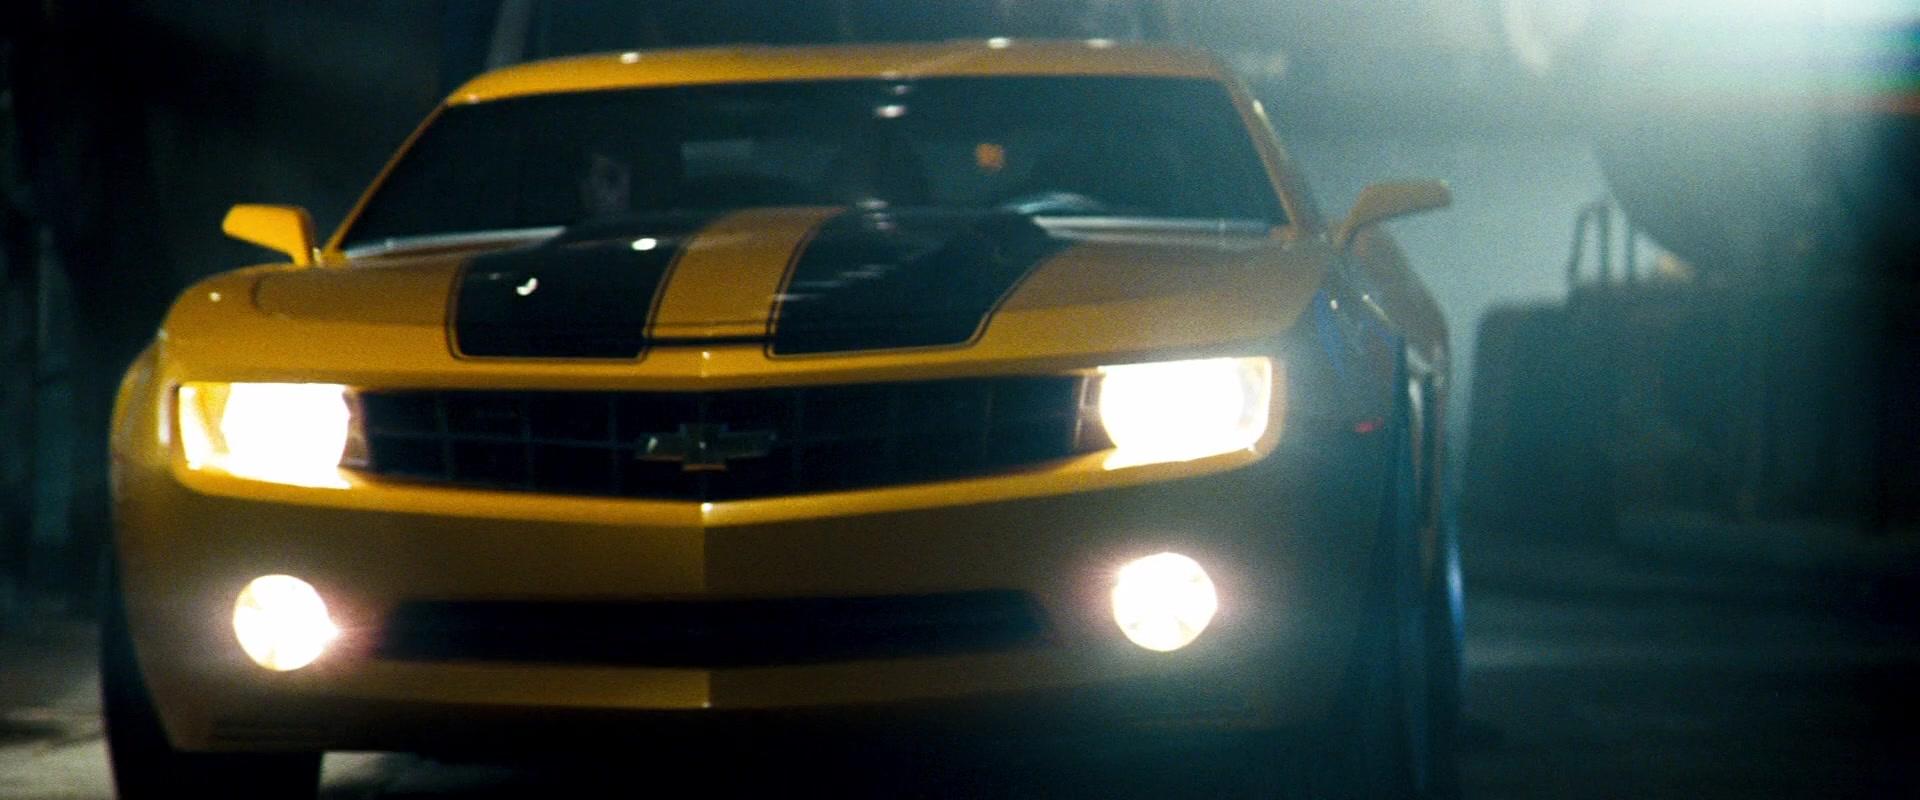 Used Car Dealership >> Chevrolet Camaro Yellow Car in Transformers (2007) Movie